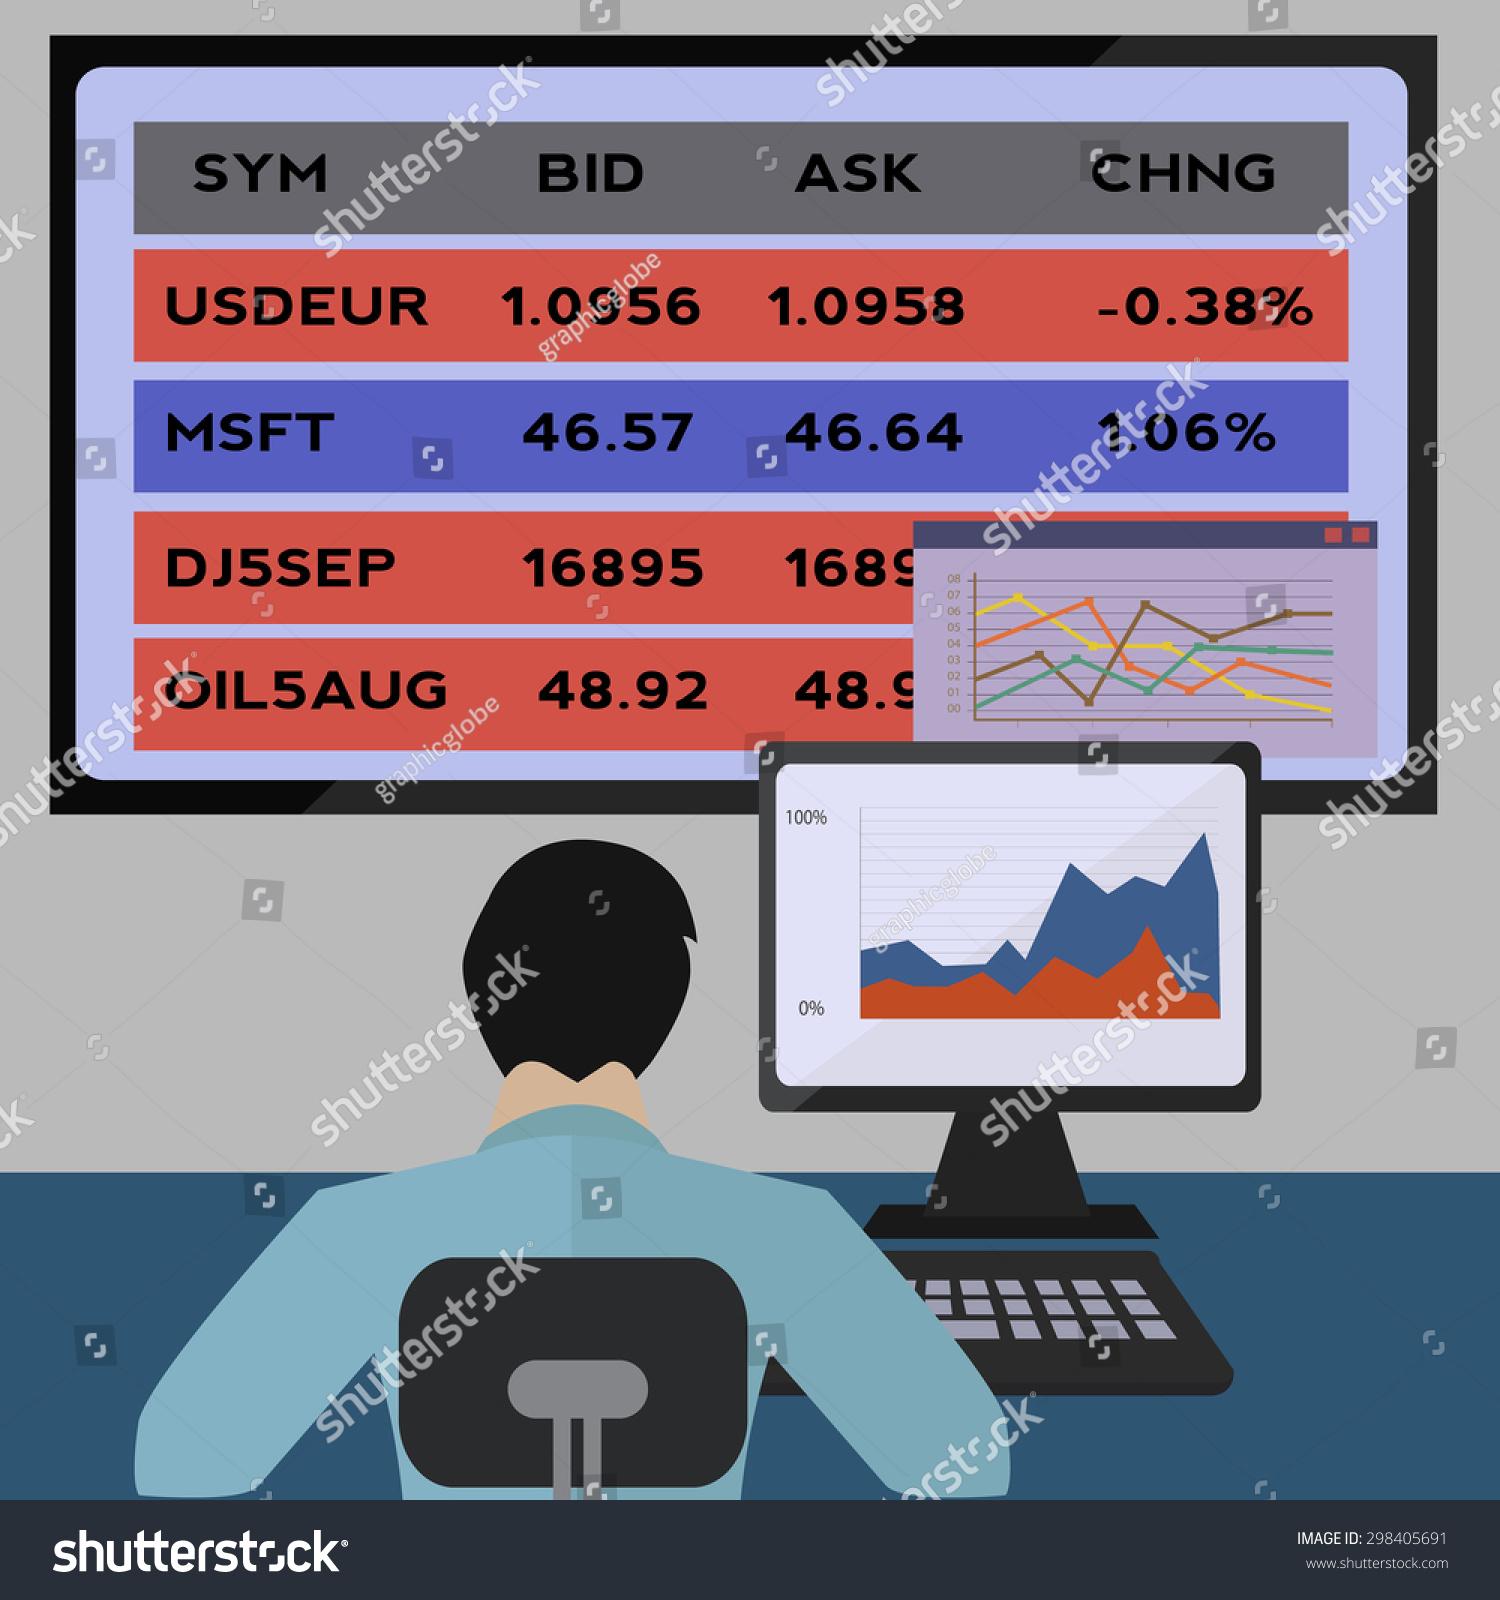 What is broker agent